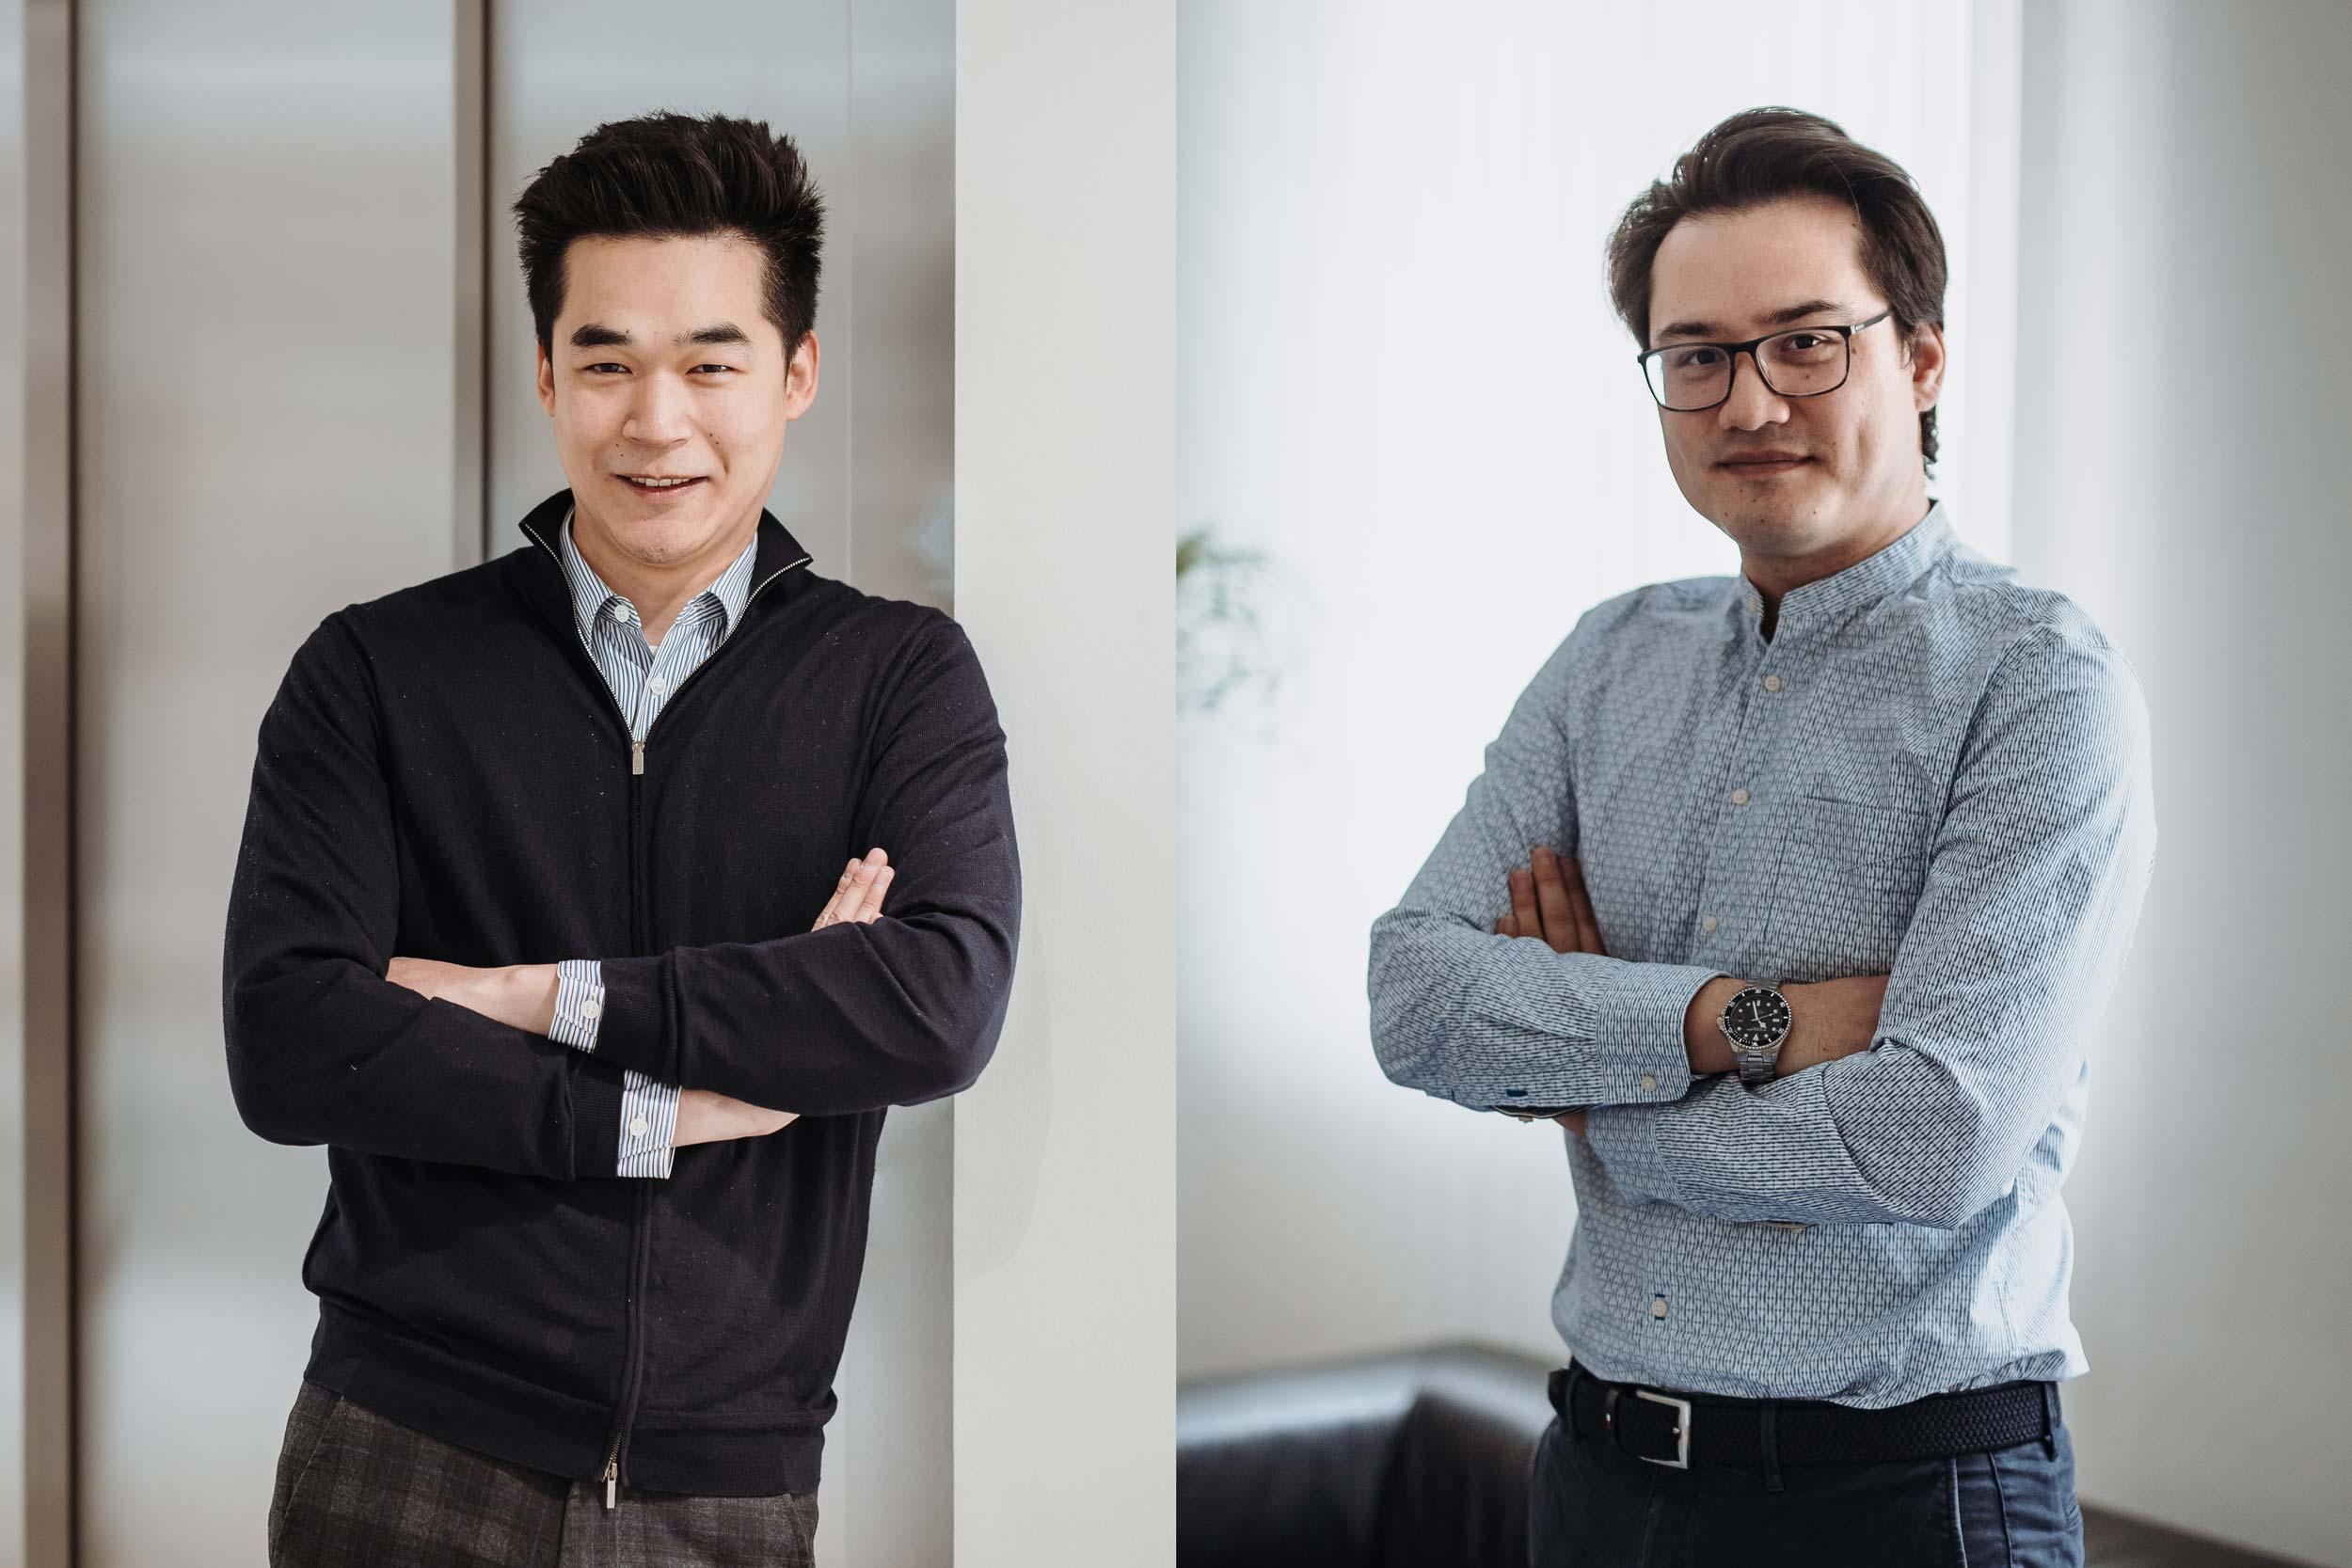 Dali Zhu & Alex Flammant